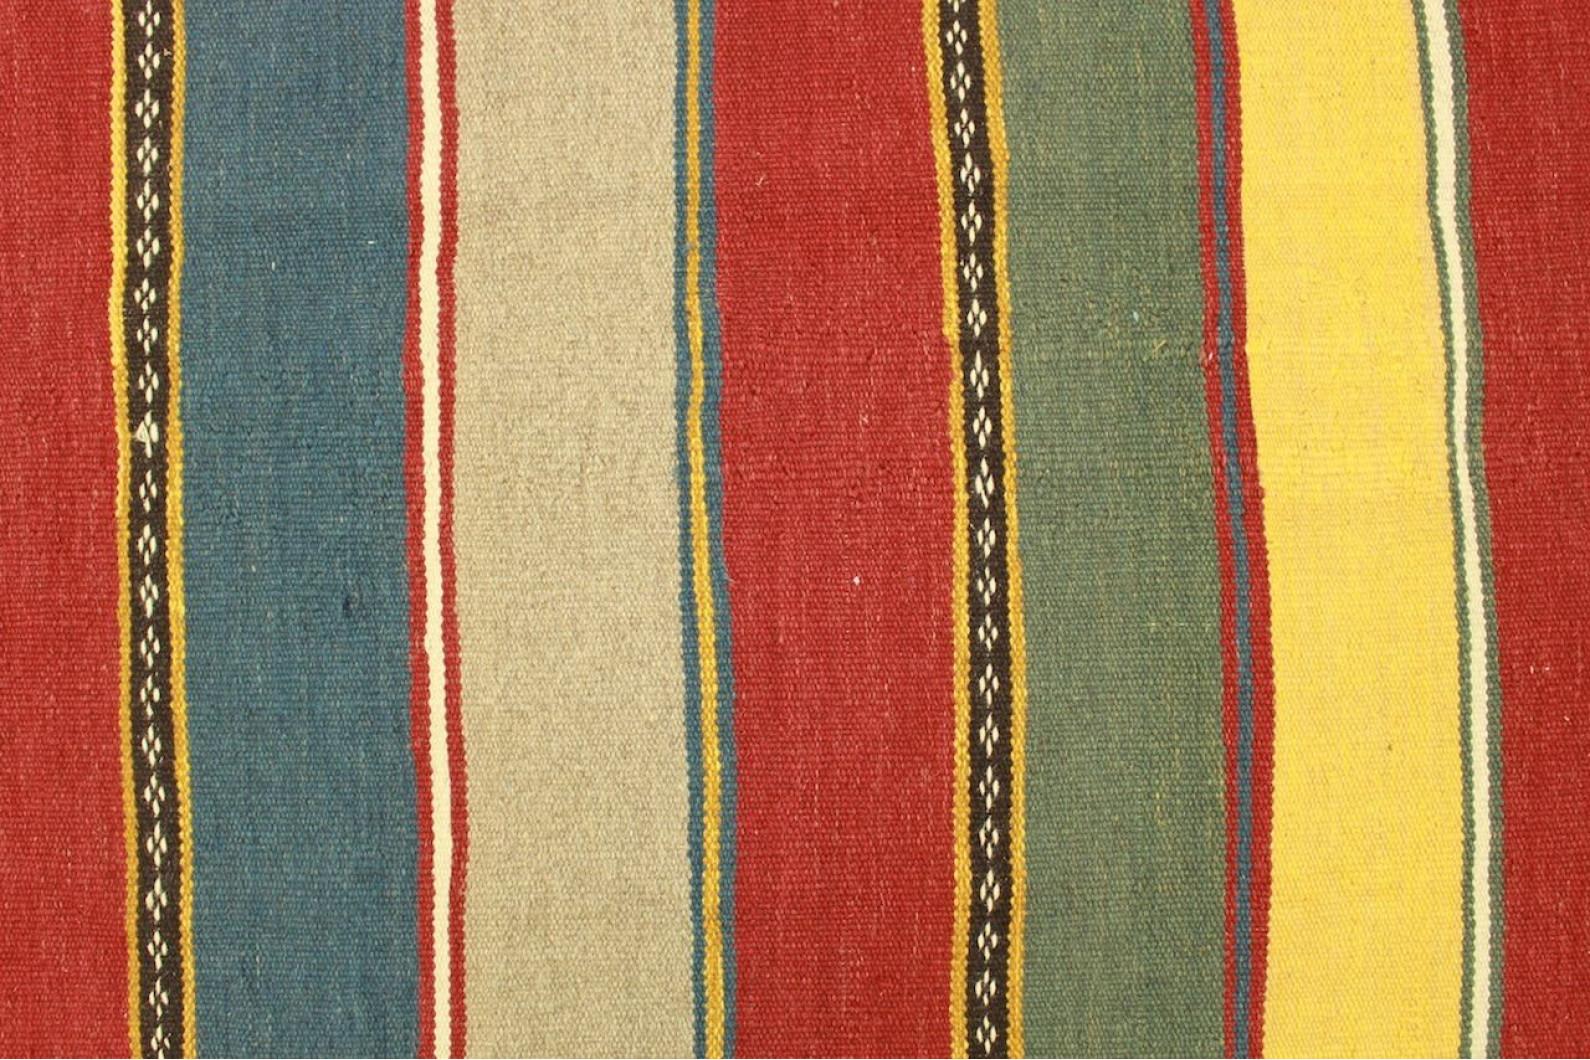 kelim teppich rot blau gelb in 260x170cm 1001 5008. Black Bedroom Furniture Sets. Home Design Ideas